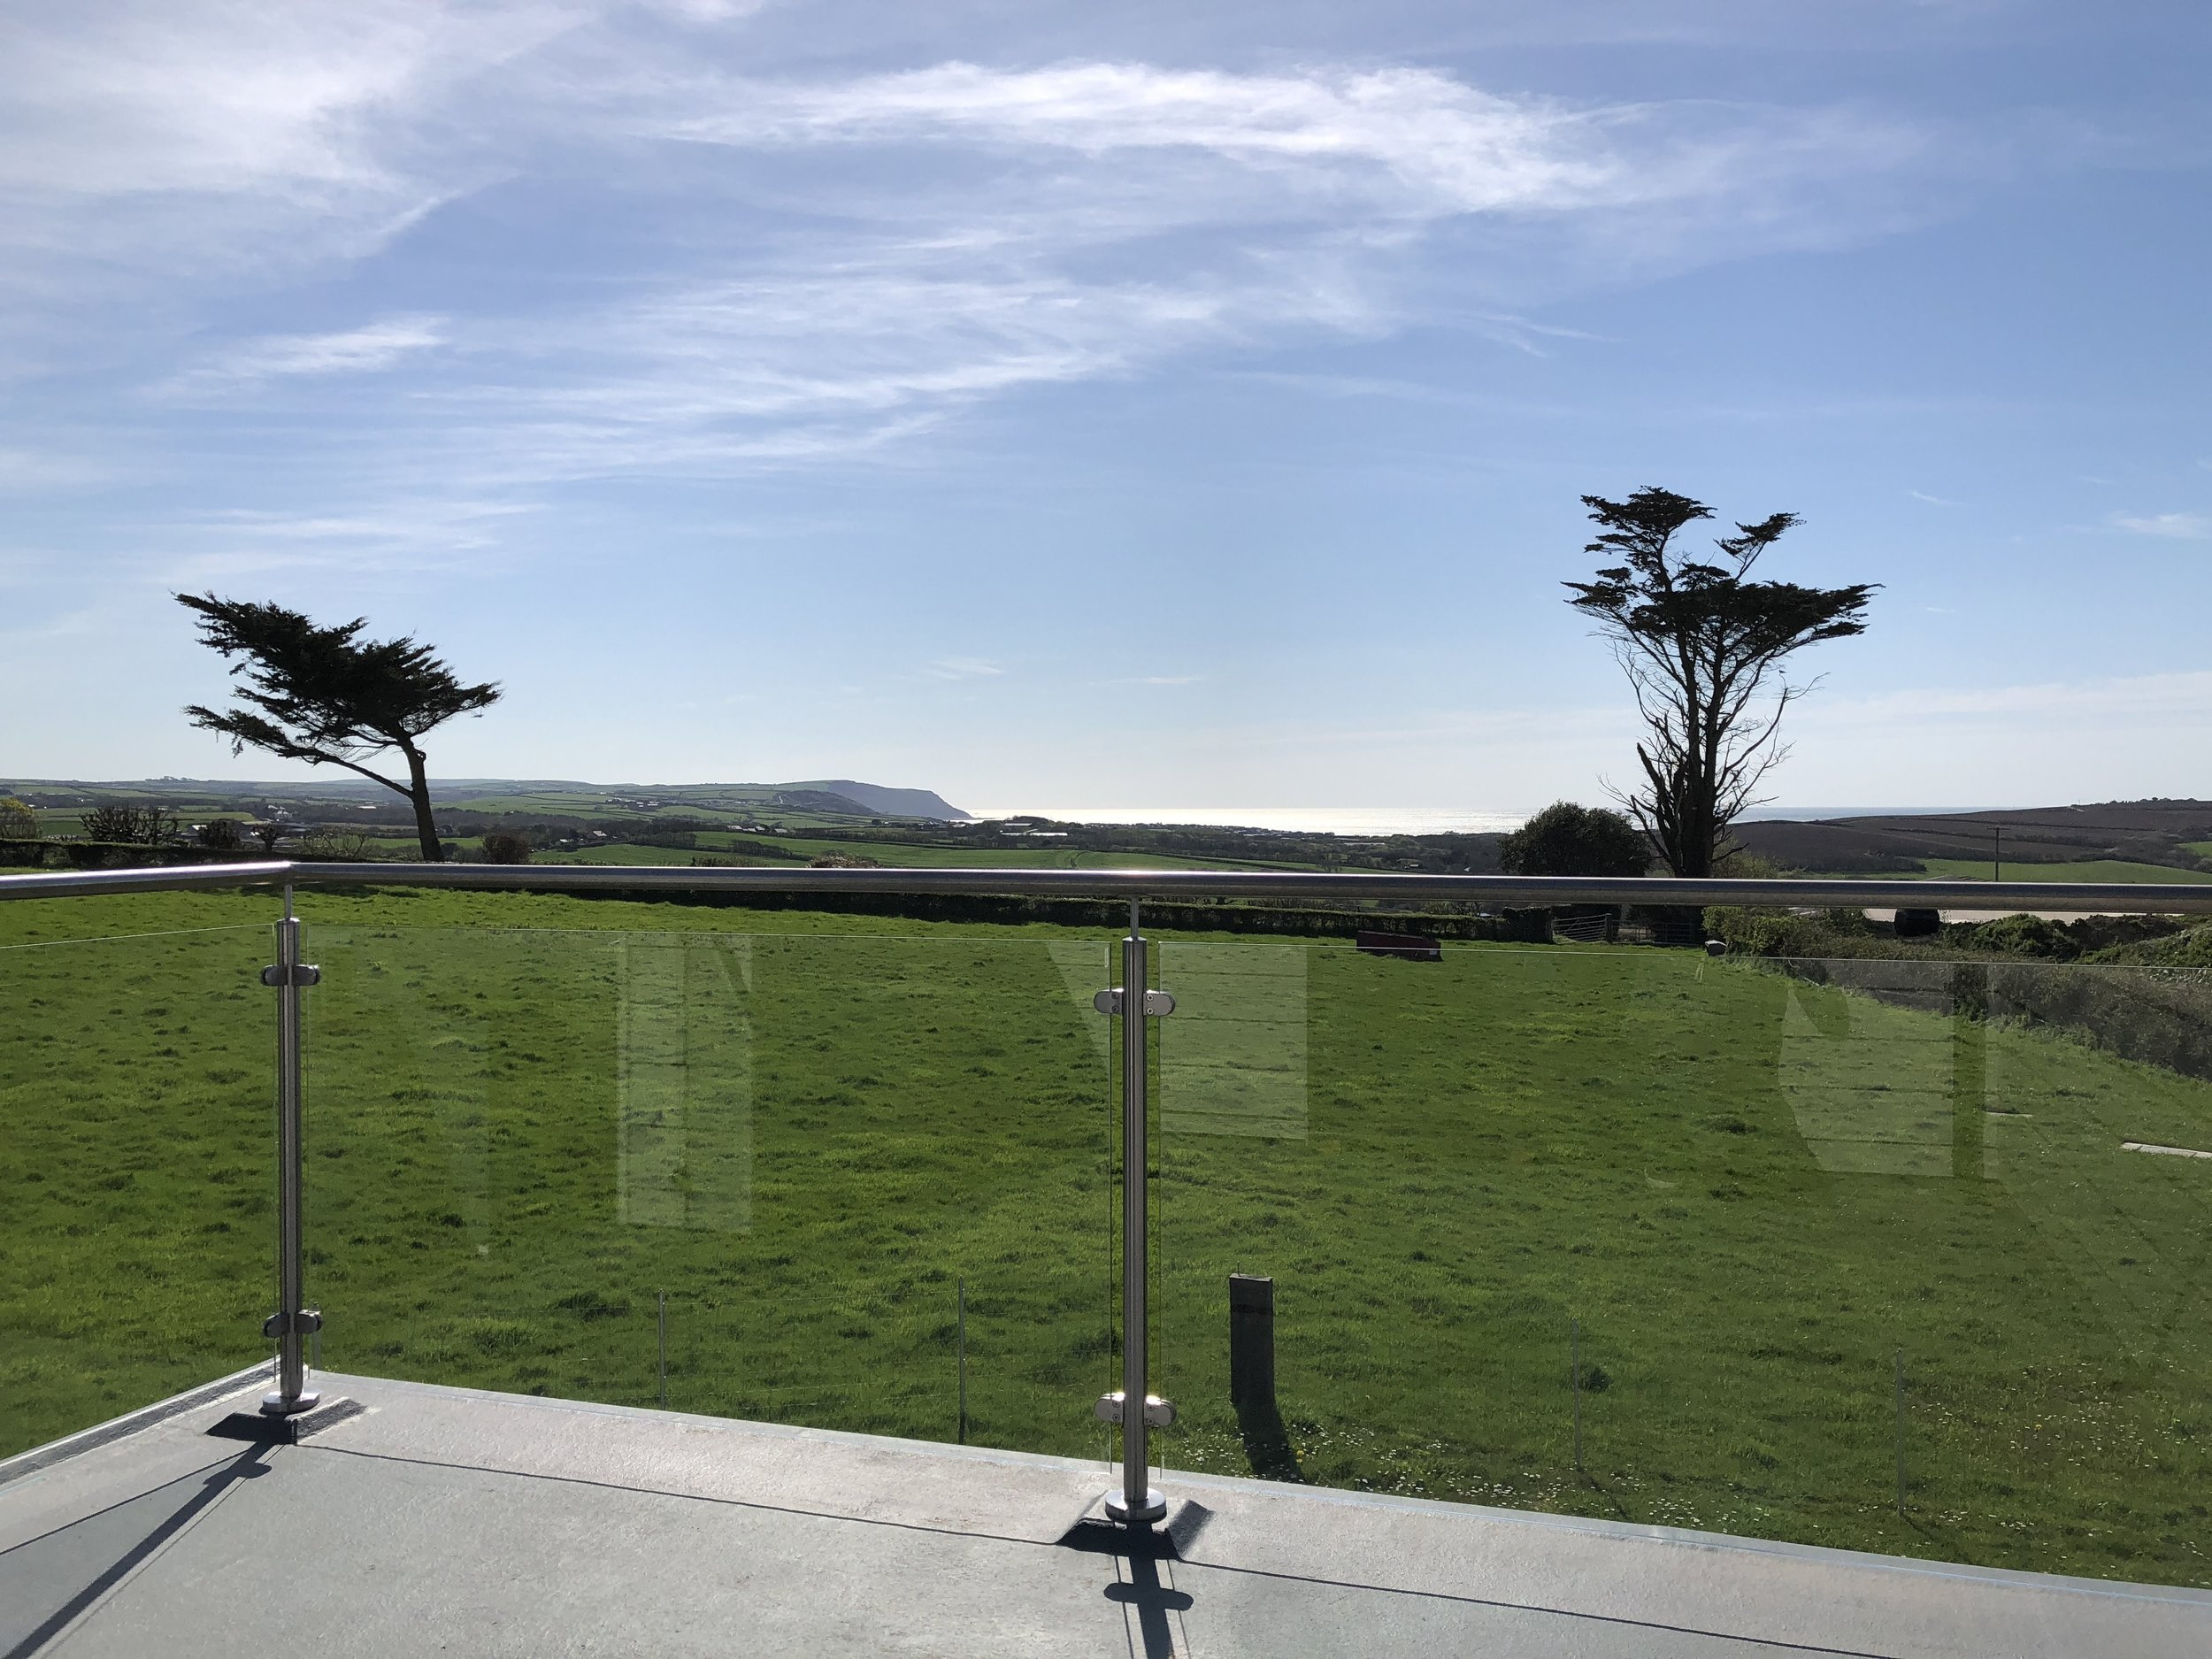 courtyard-barns-overview-2.jpg